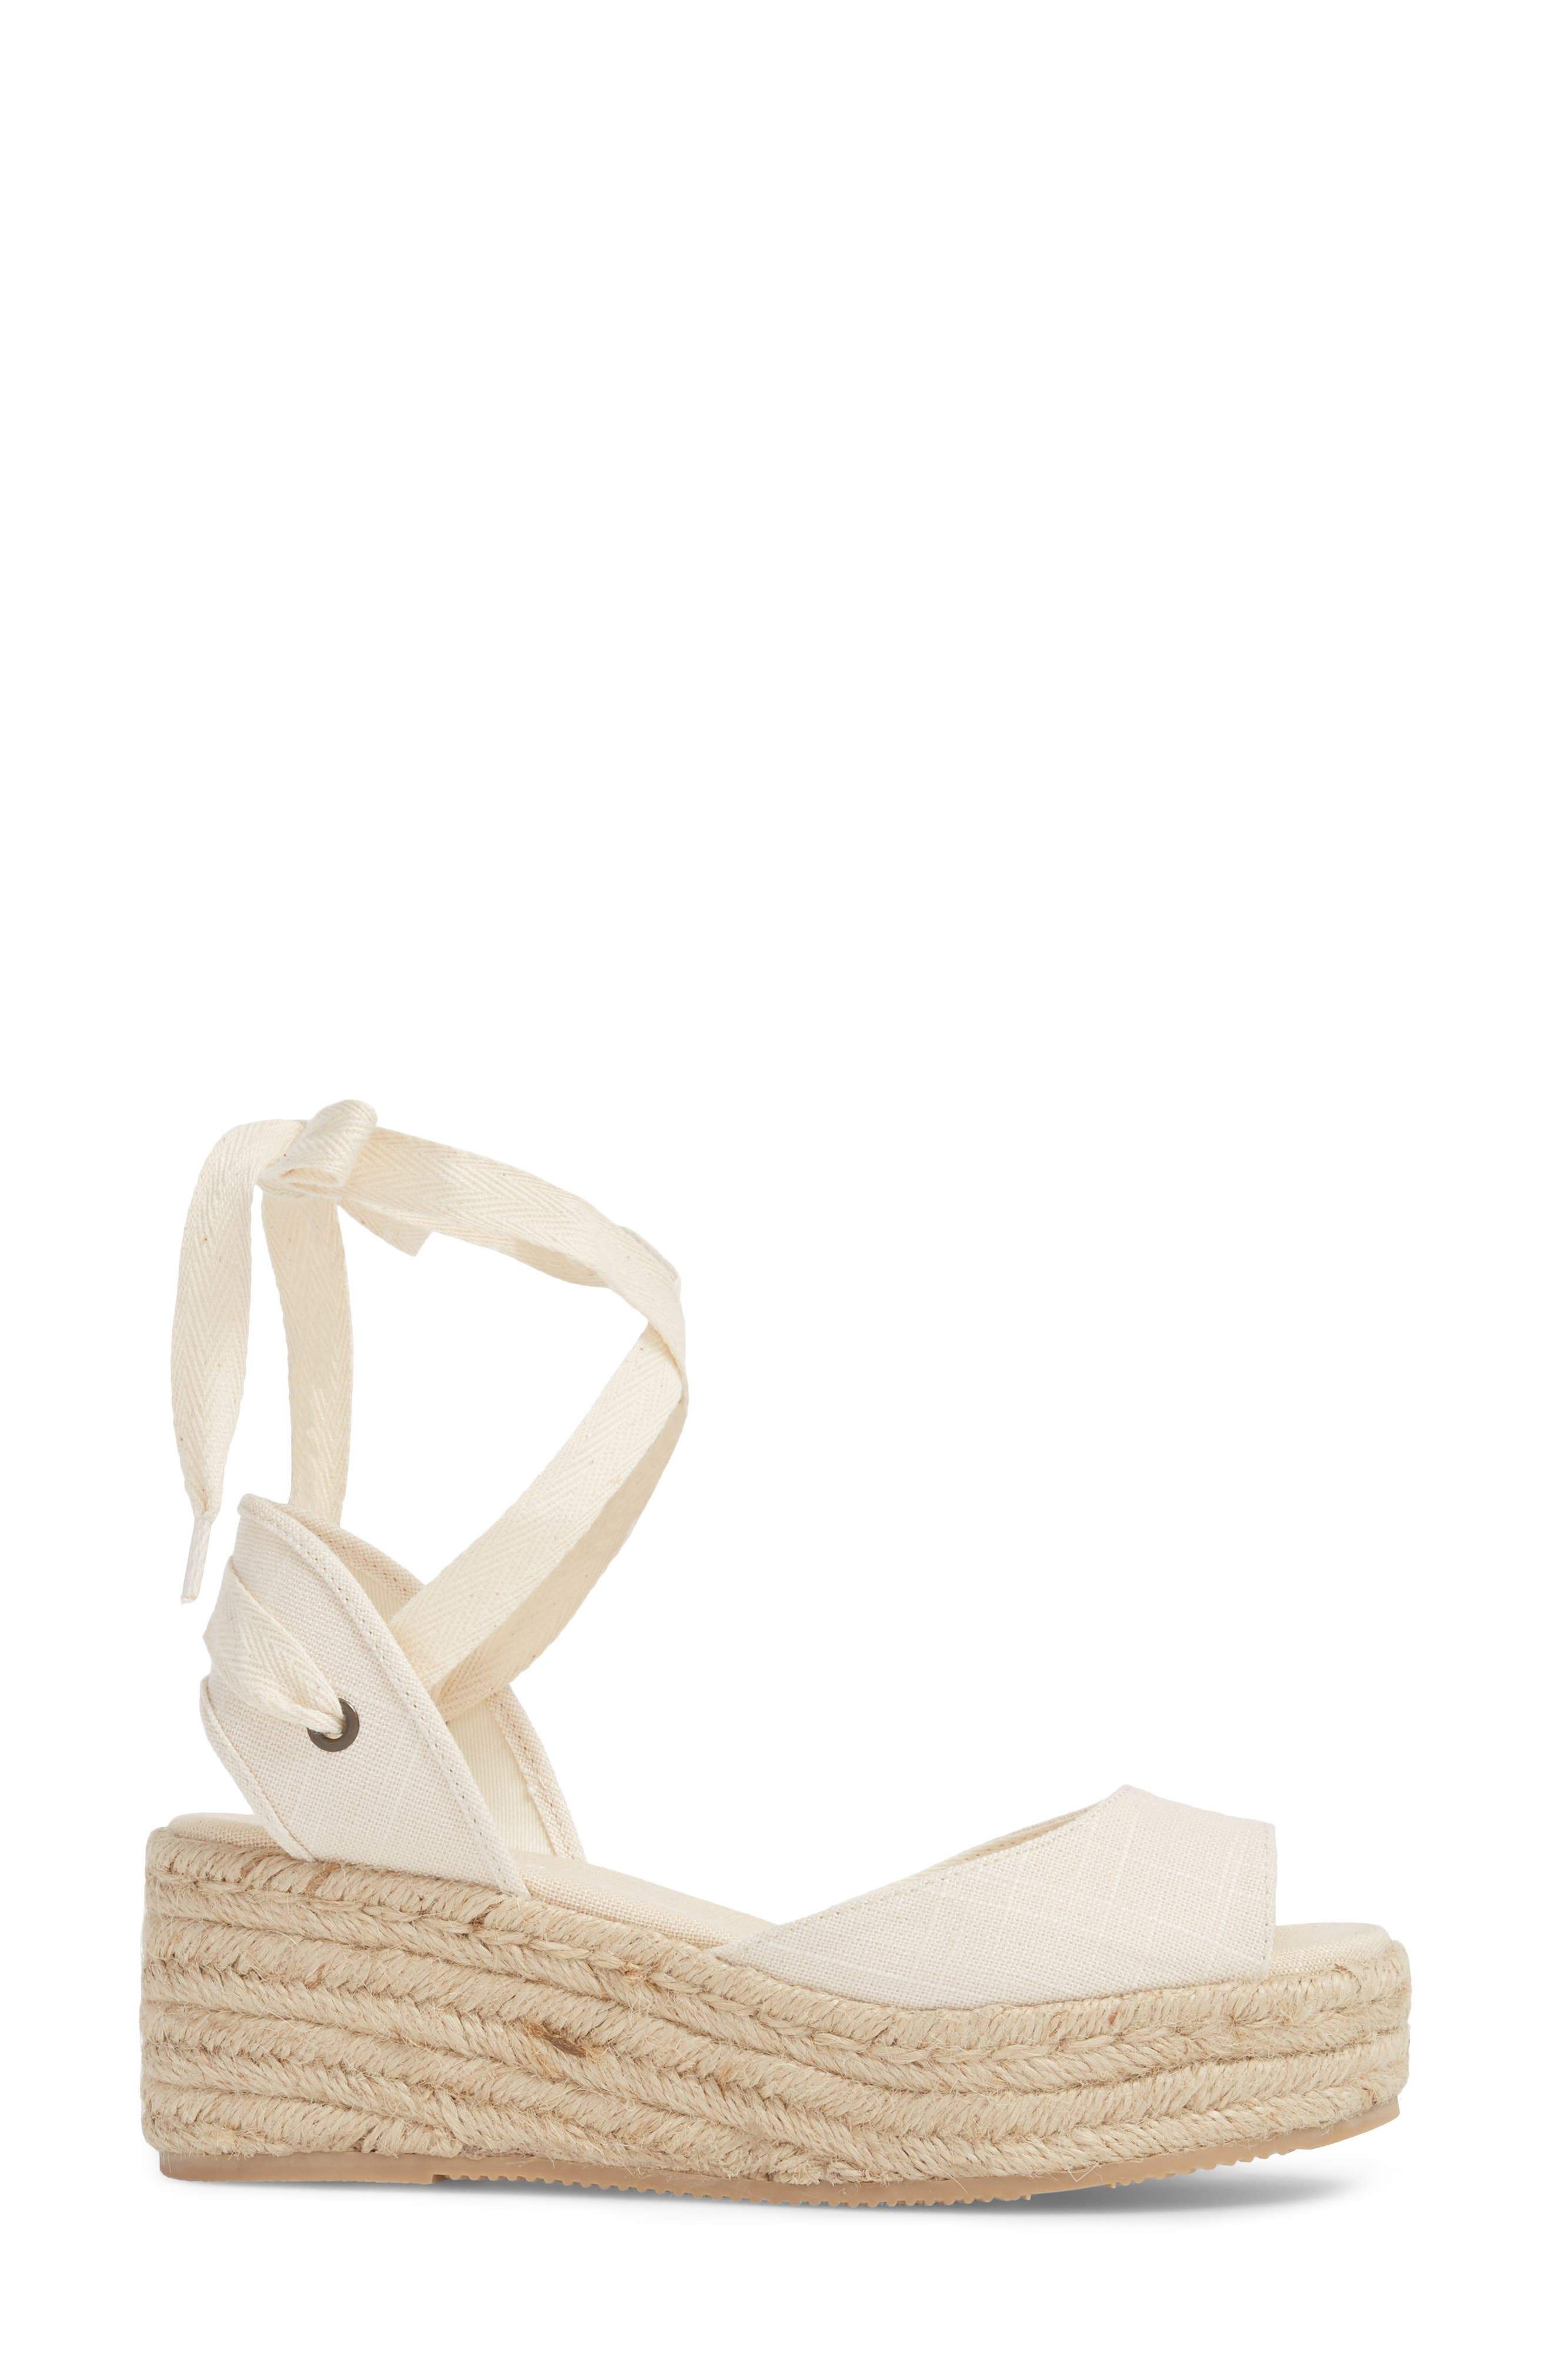 Espadrille Platform Sandal,                             Alternate thumbnail 3, color,                             Blush Fabric